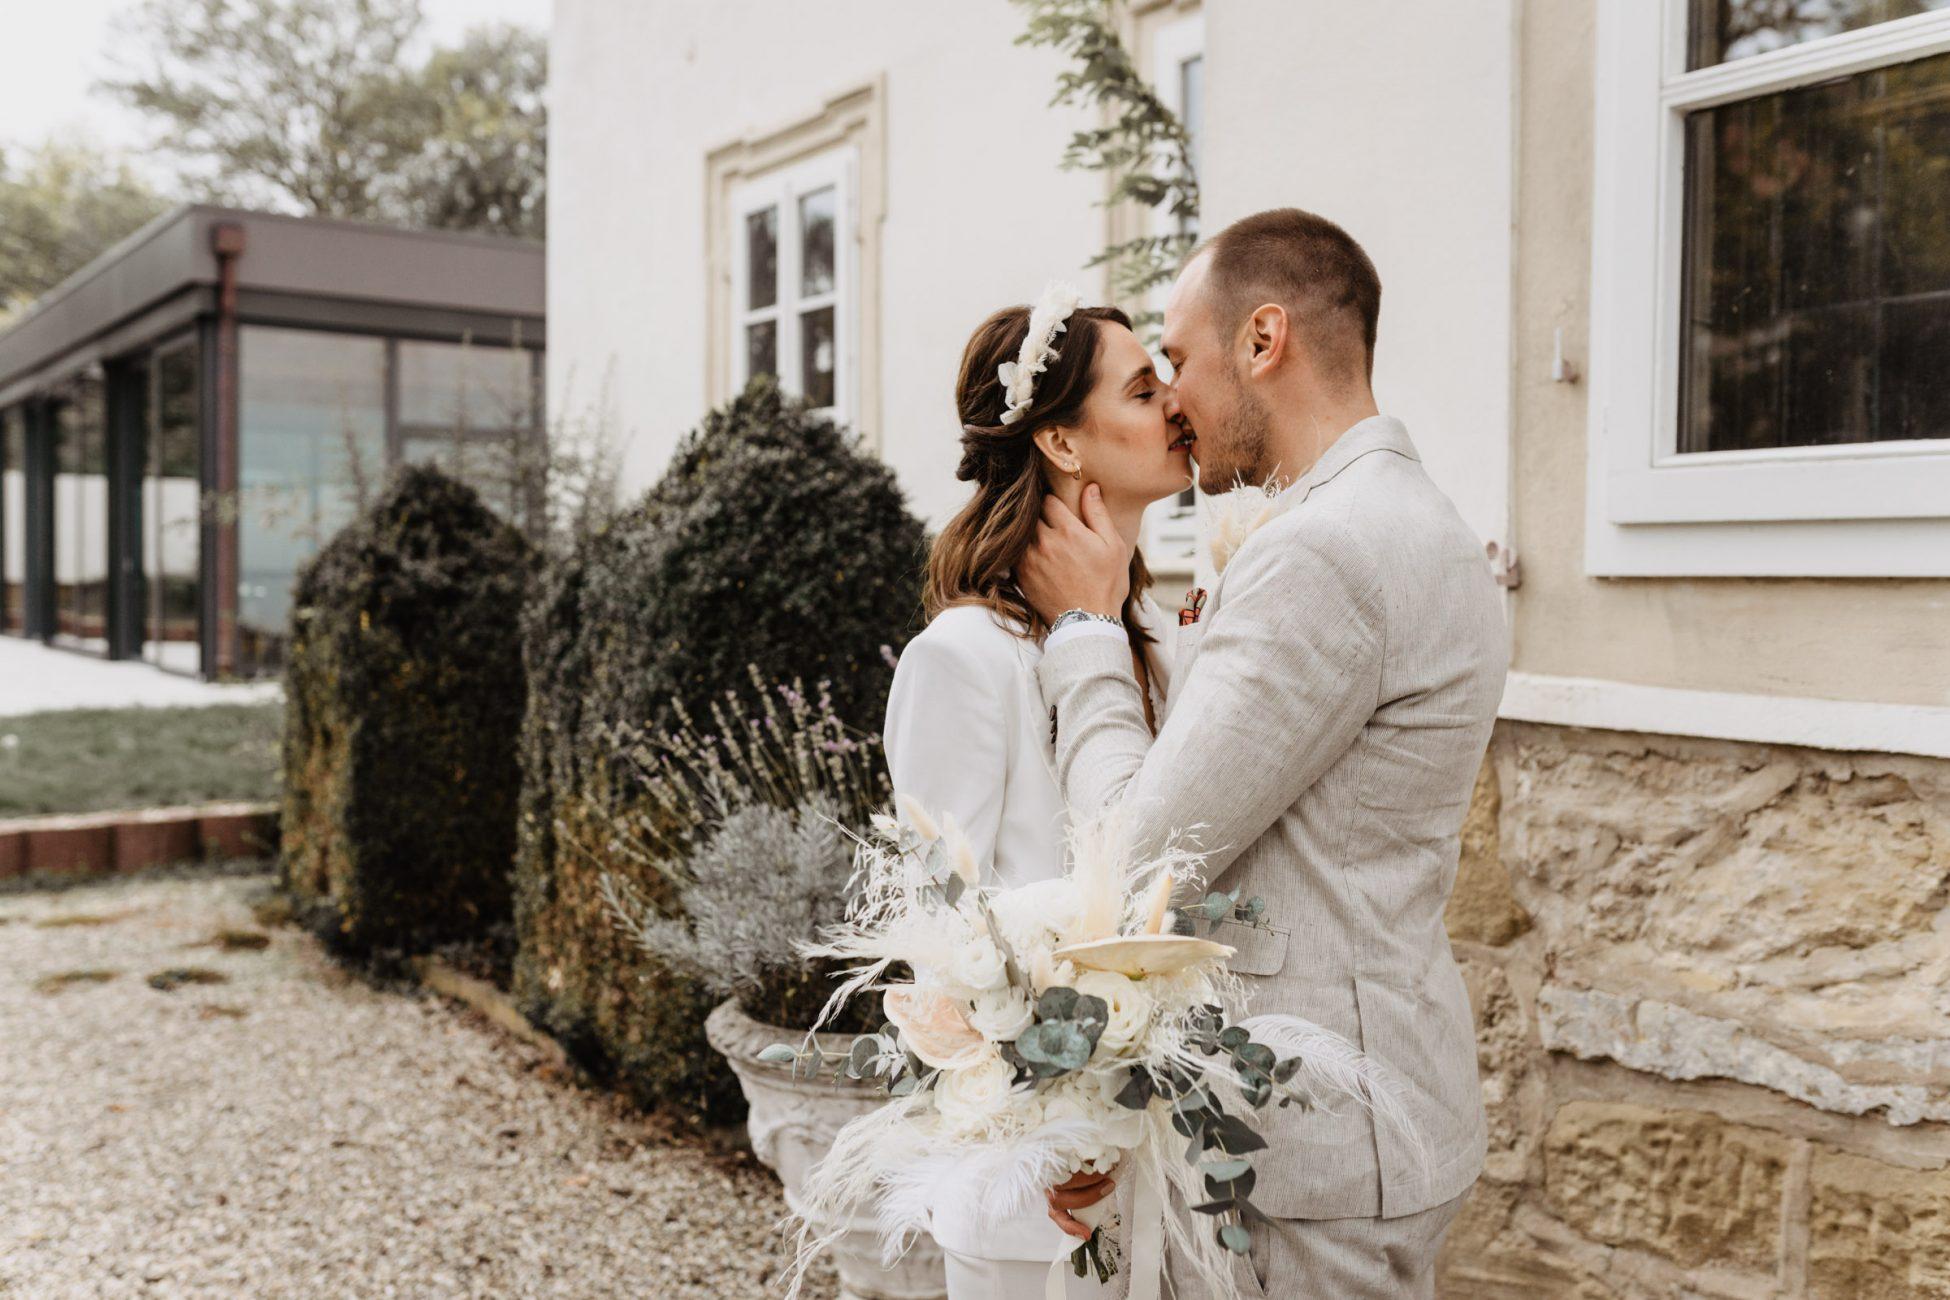 Fotografin-Hochzeit-Heilbronn-Brautpaarfotoshooting-Heilbronn-by-Julia-Loeffler-Fotografie-34